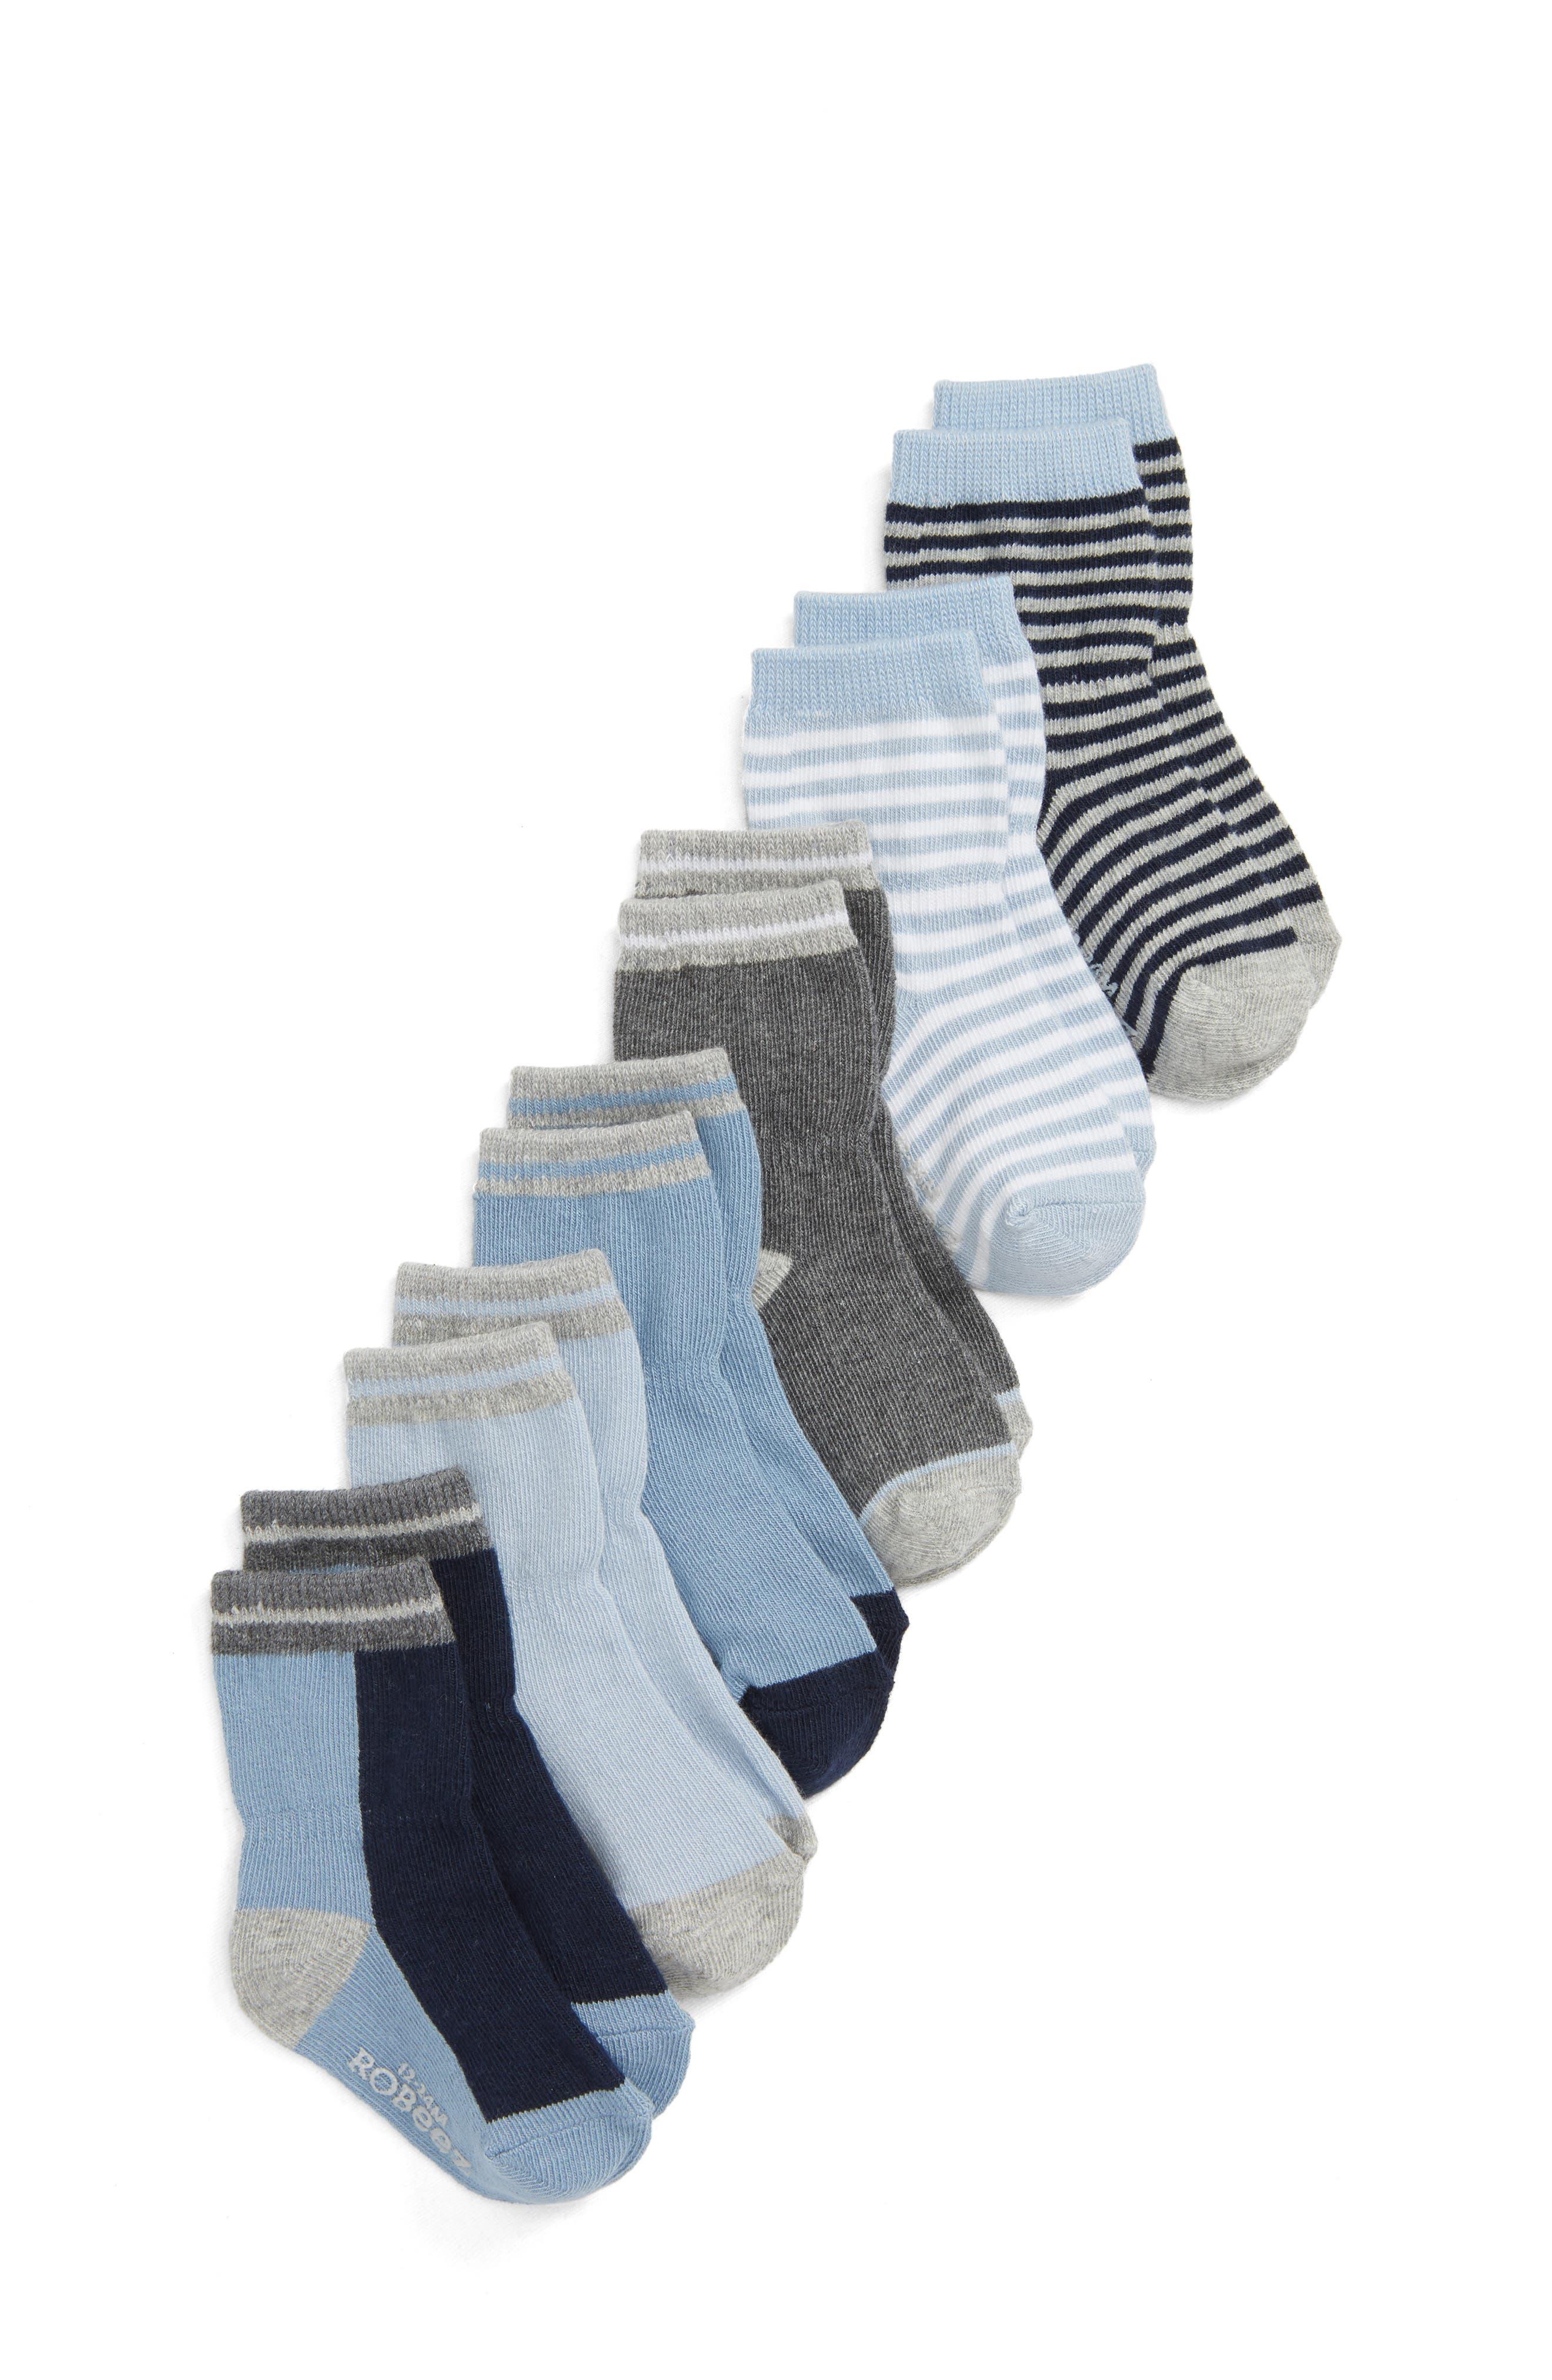 Benjamin Blue 6-Pack Socks,                             Main thumbnail 1, color,                             BLUE